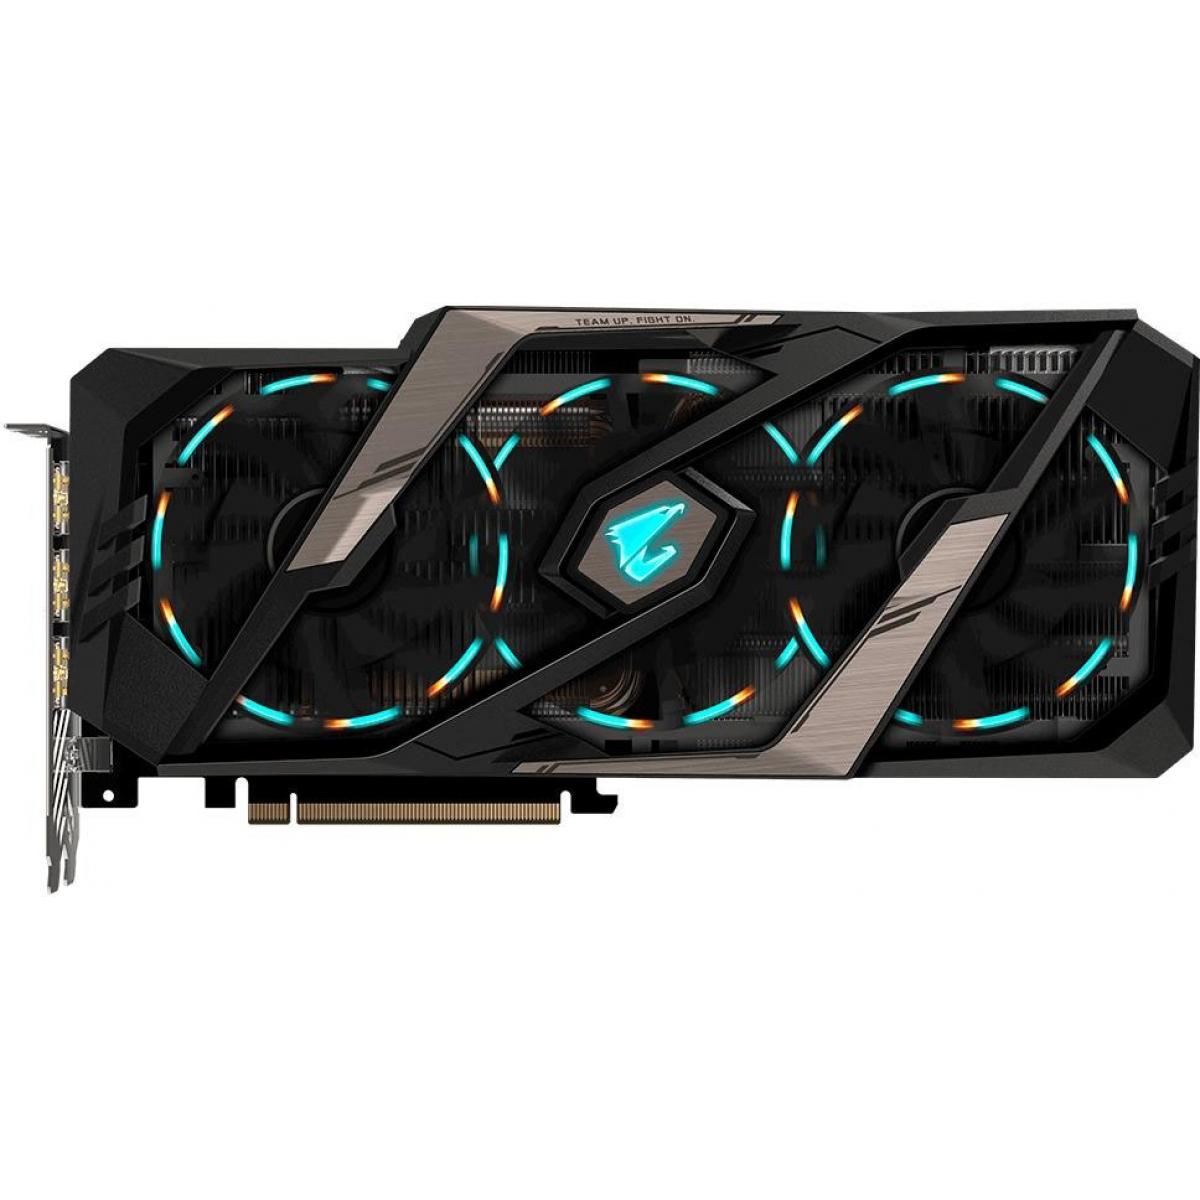 Placa de Video Gigabyte GeForce RTX 2080 Ti Aorus, 11GB GDDR6, 352Bit